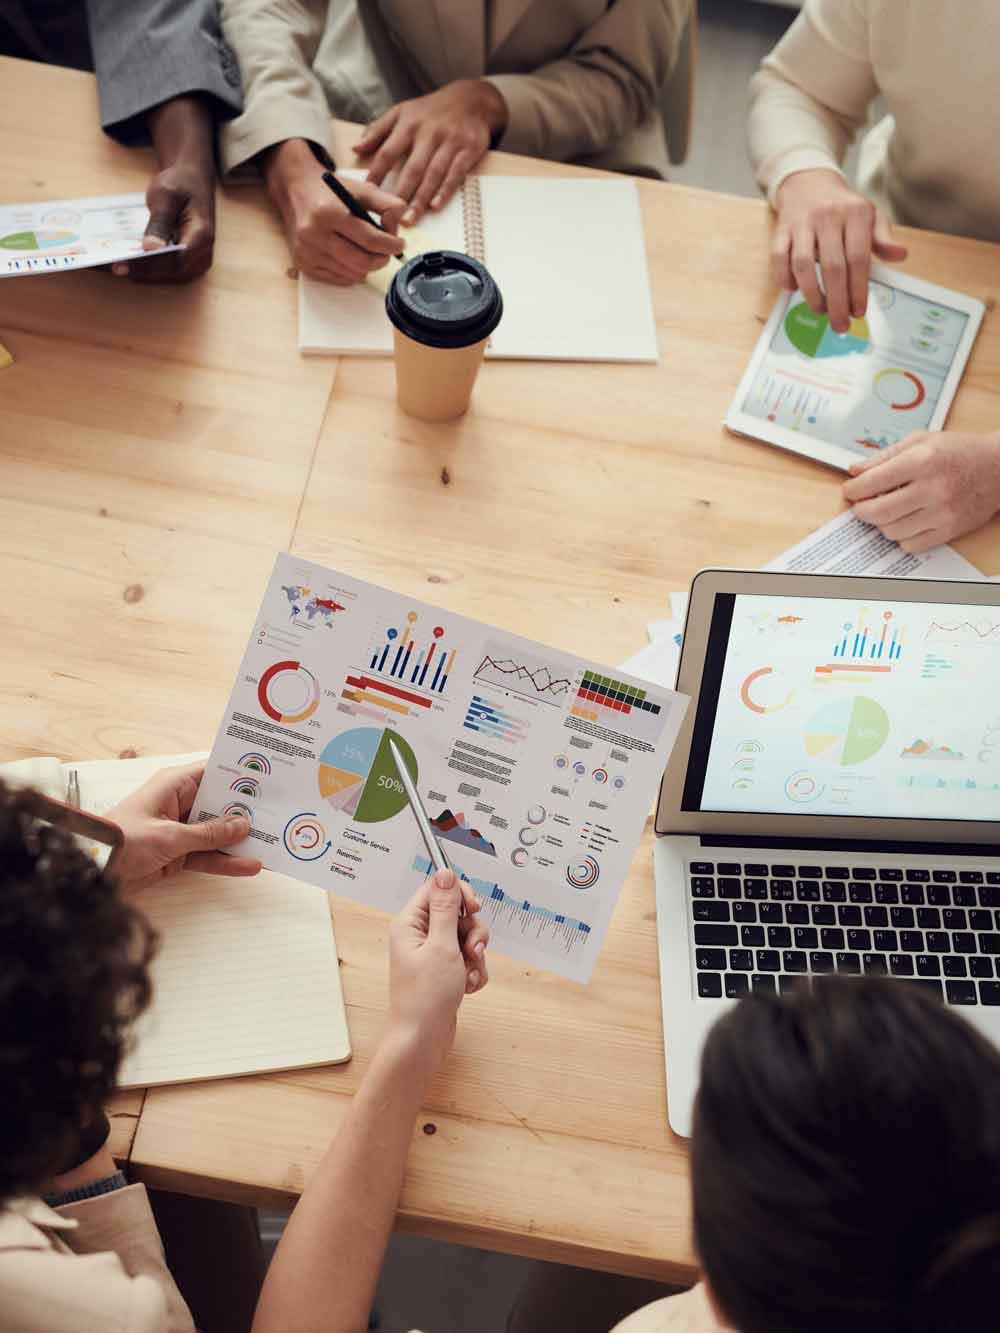 Digital Marketing White Label Agency